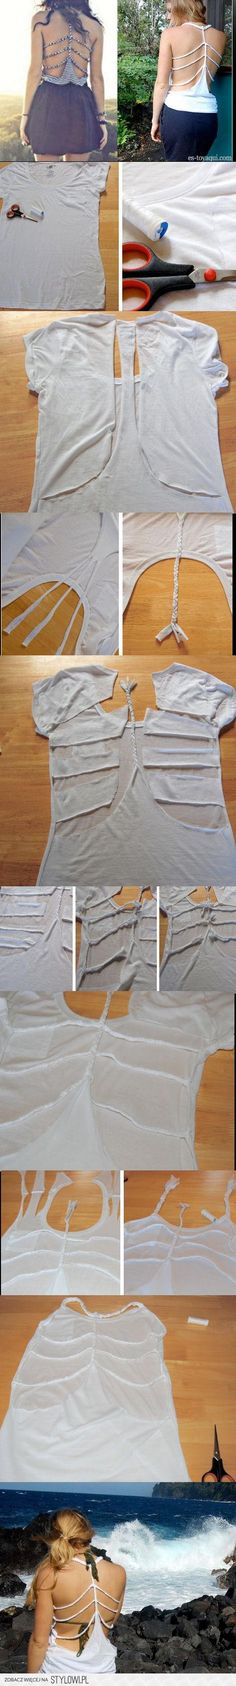 cool shirt :)